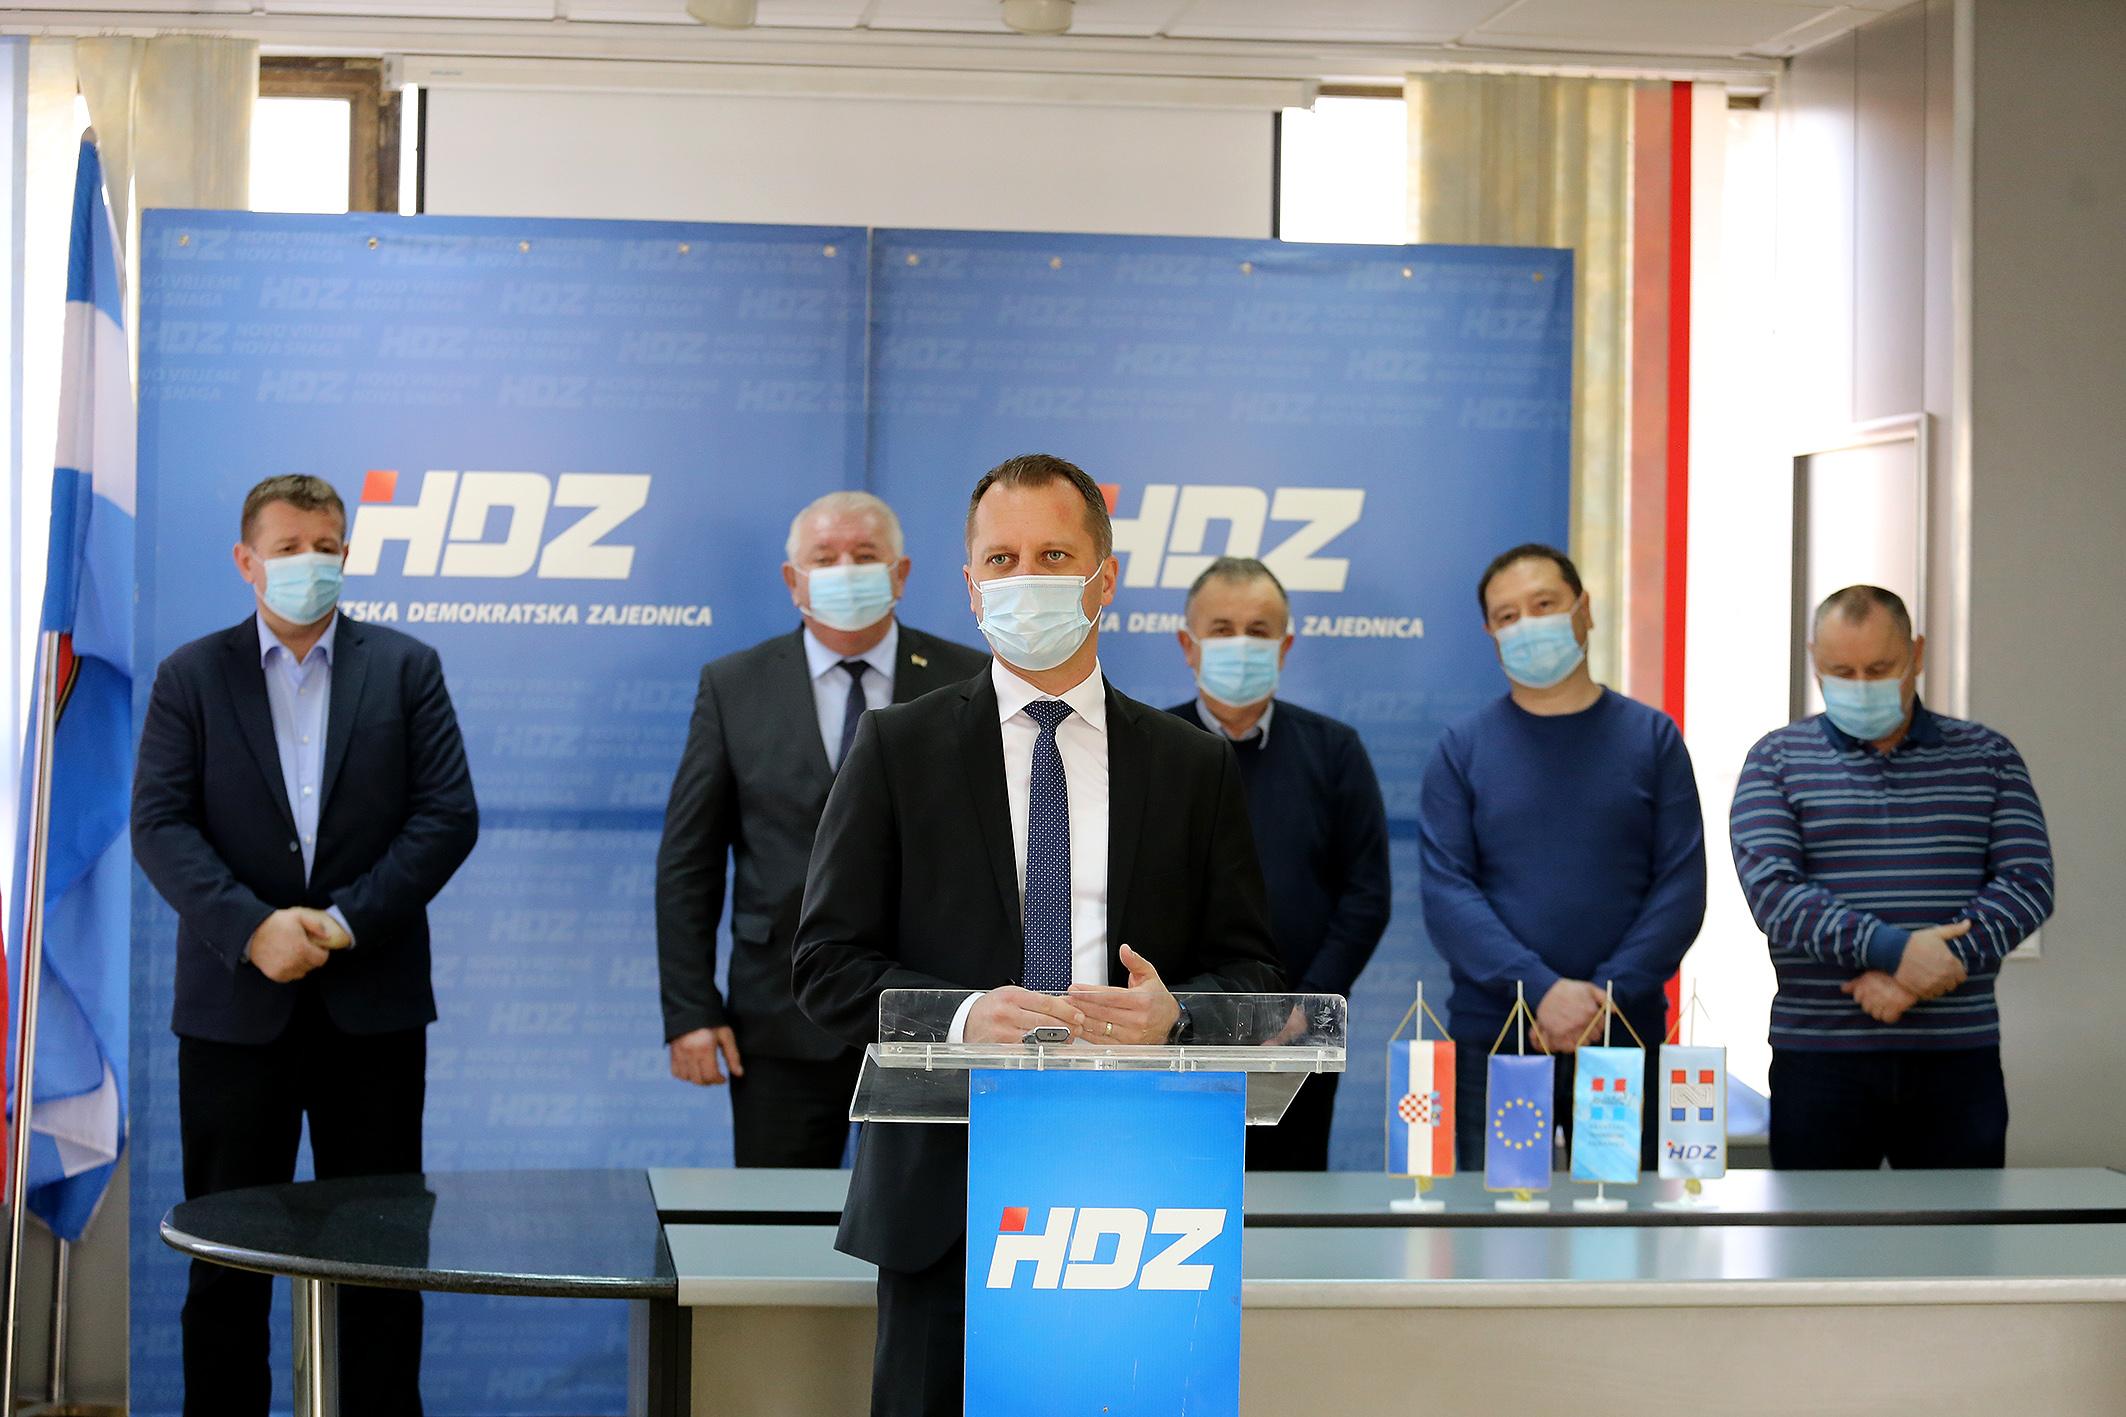 HDZ press (4)